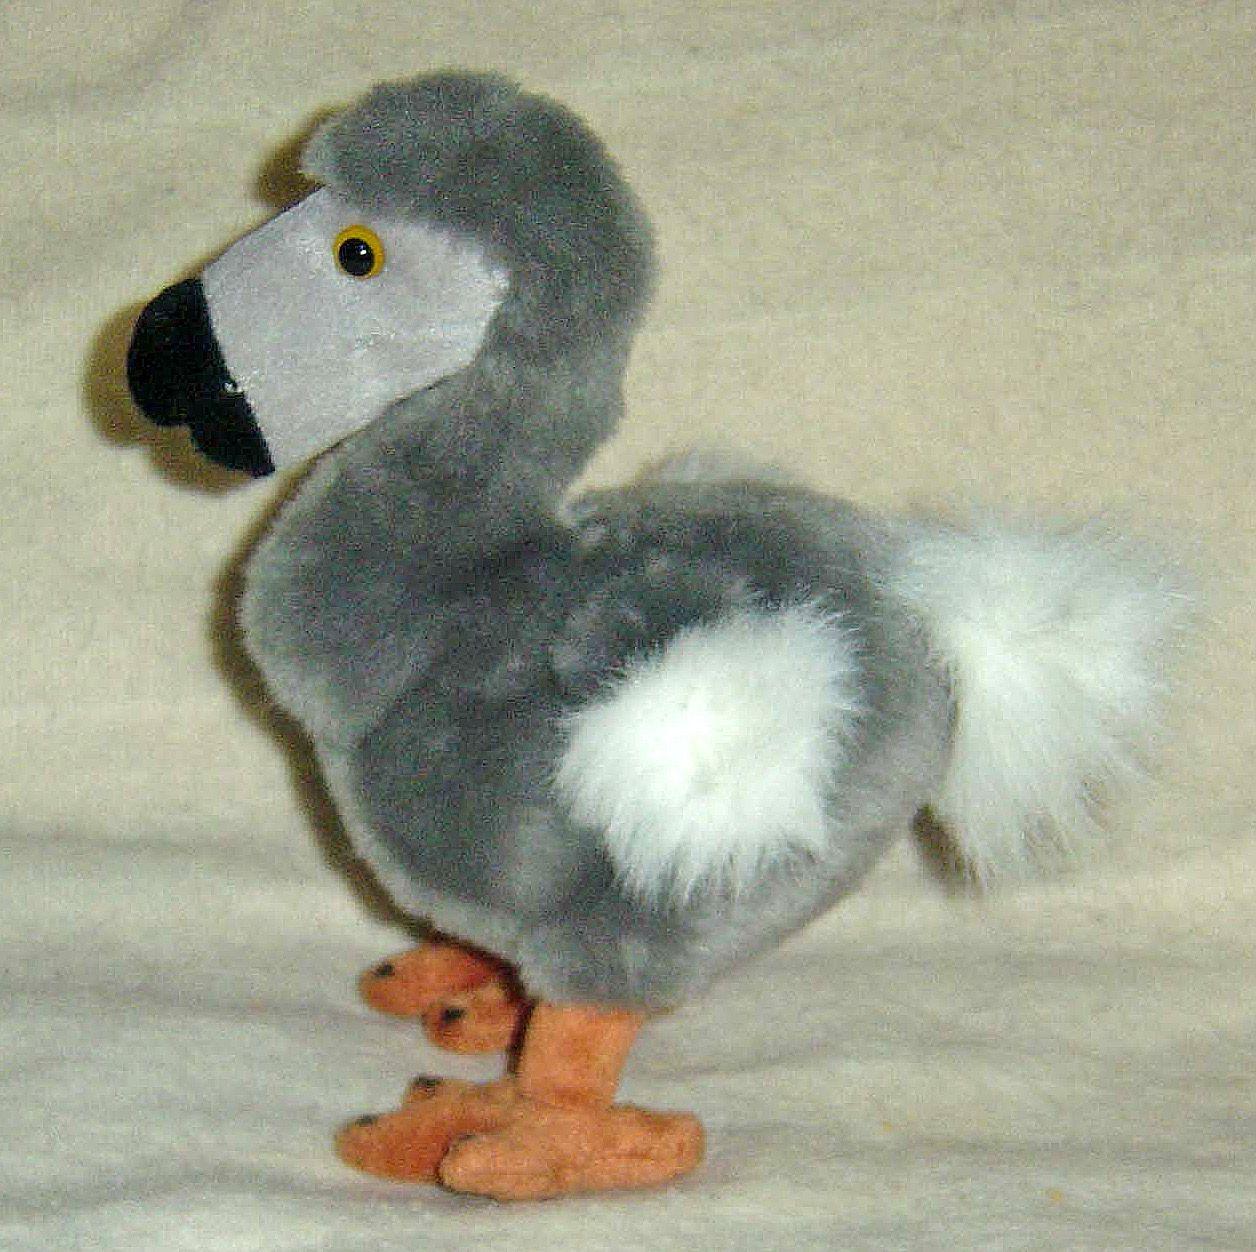 Rare Stuffed Dodo by Wild Republic. Gift from the creator Jeff ...